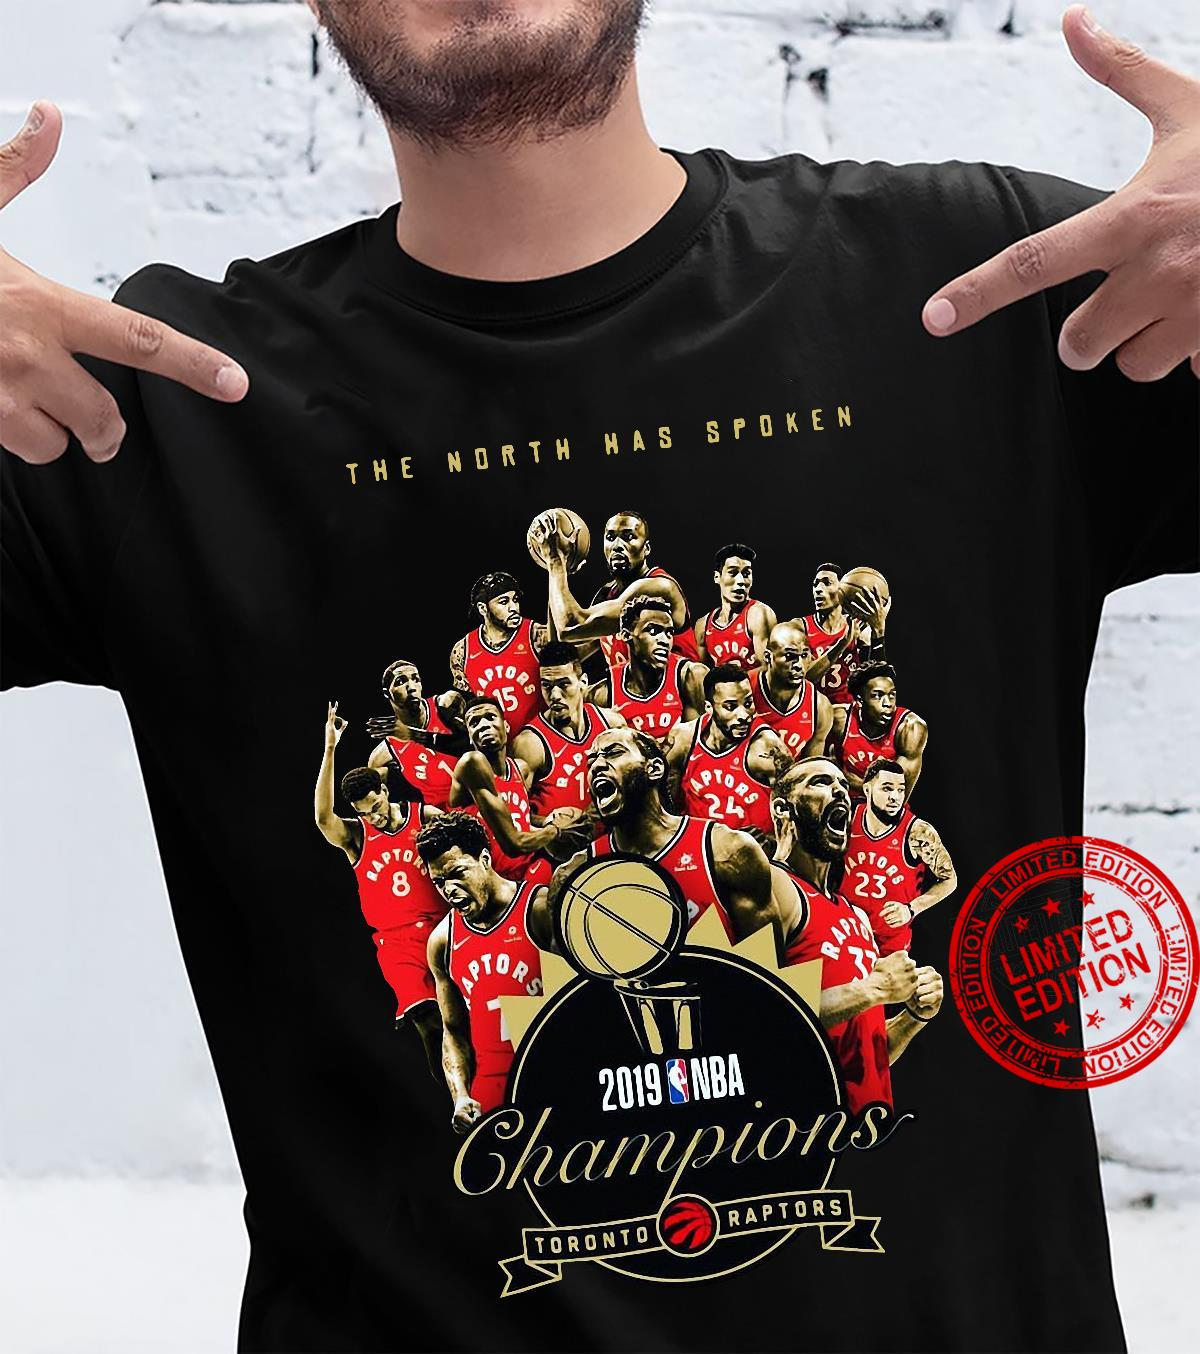 The North has spoken 2019 NBA Champions Toronto Raptors shirt